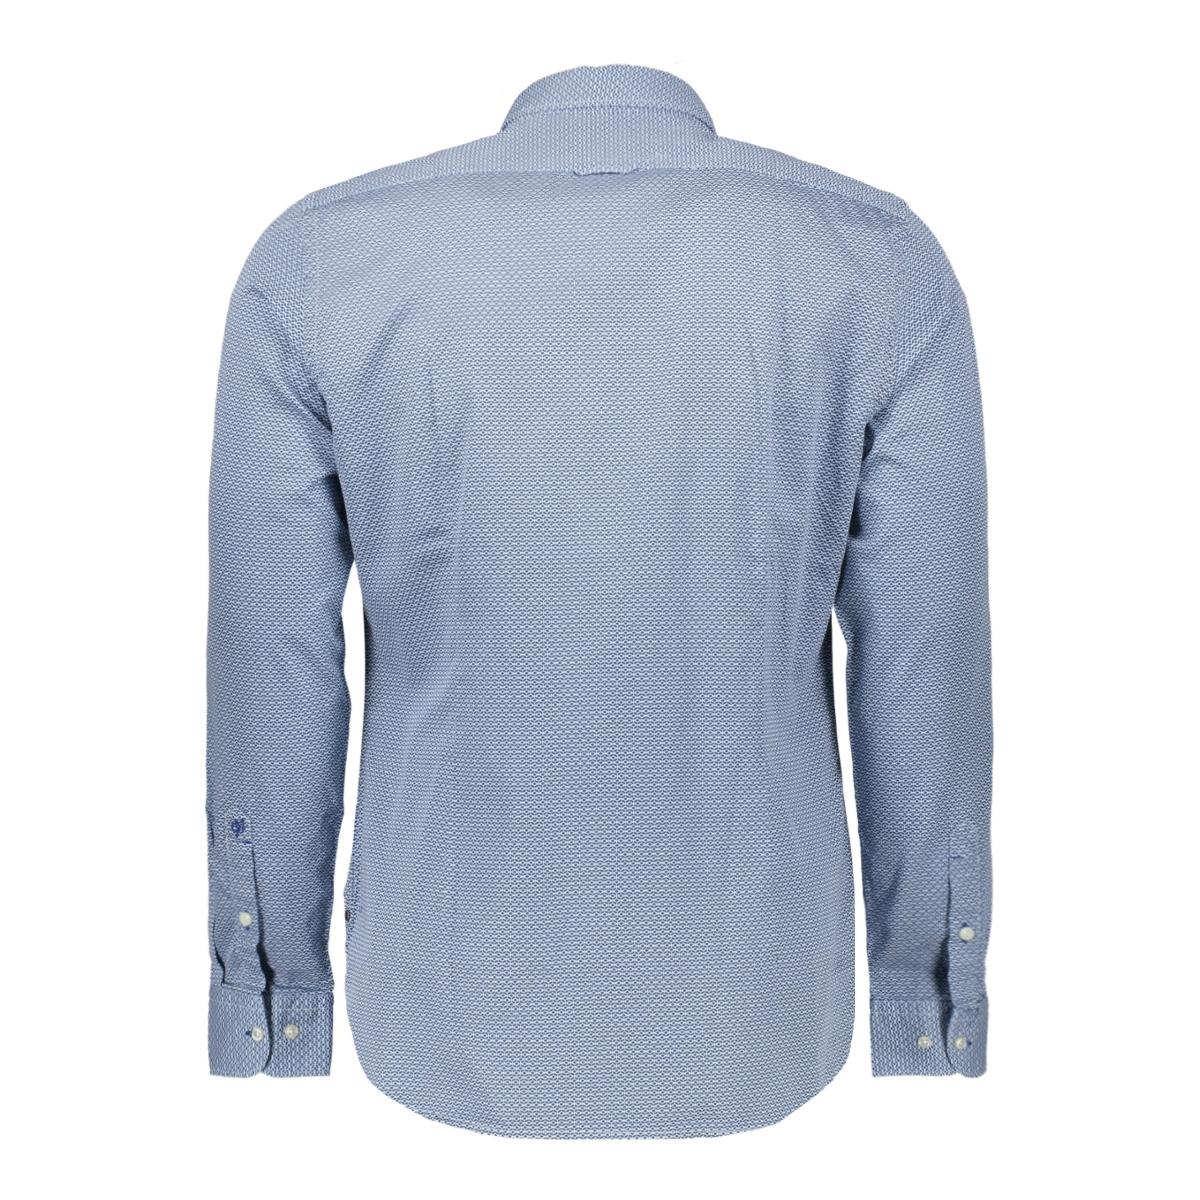 728 7338 42158 marc o`polo overhemd v86